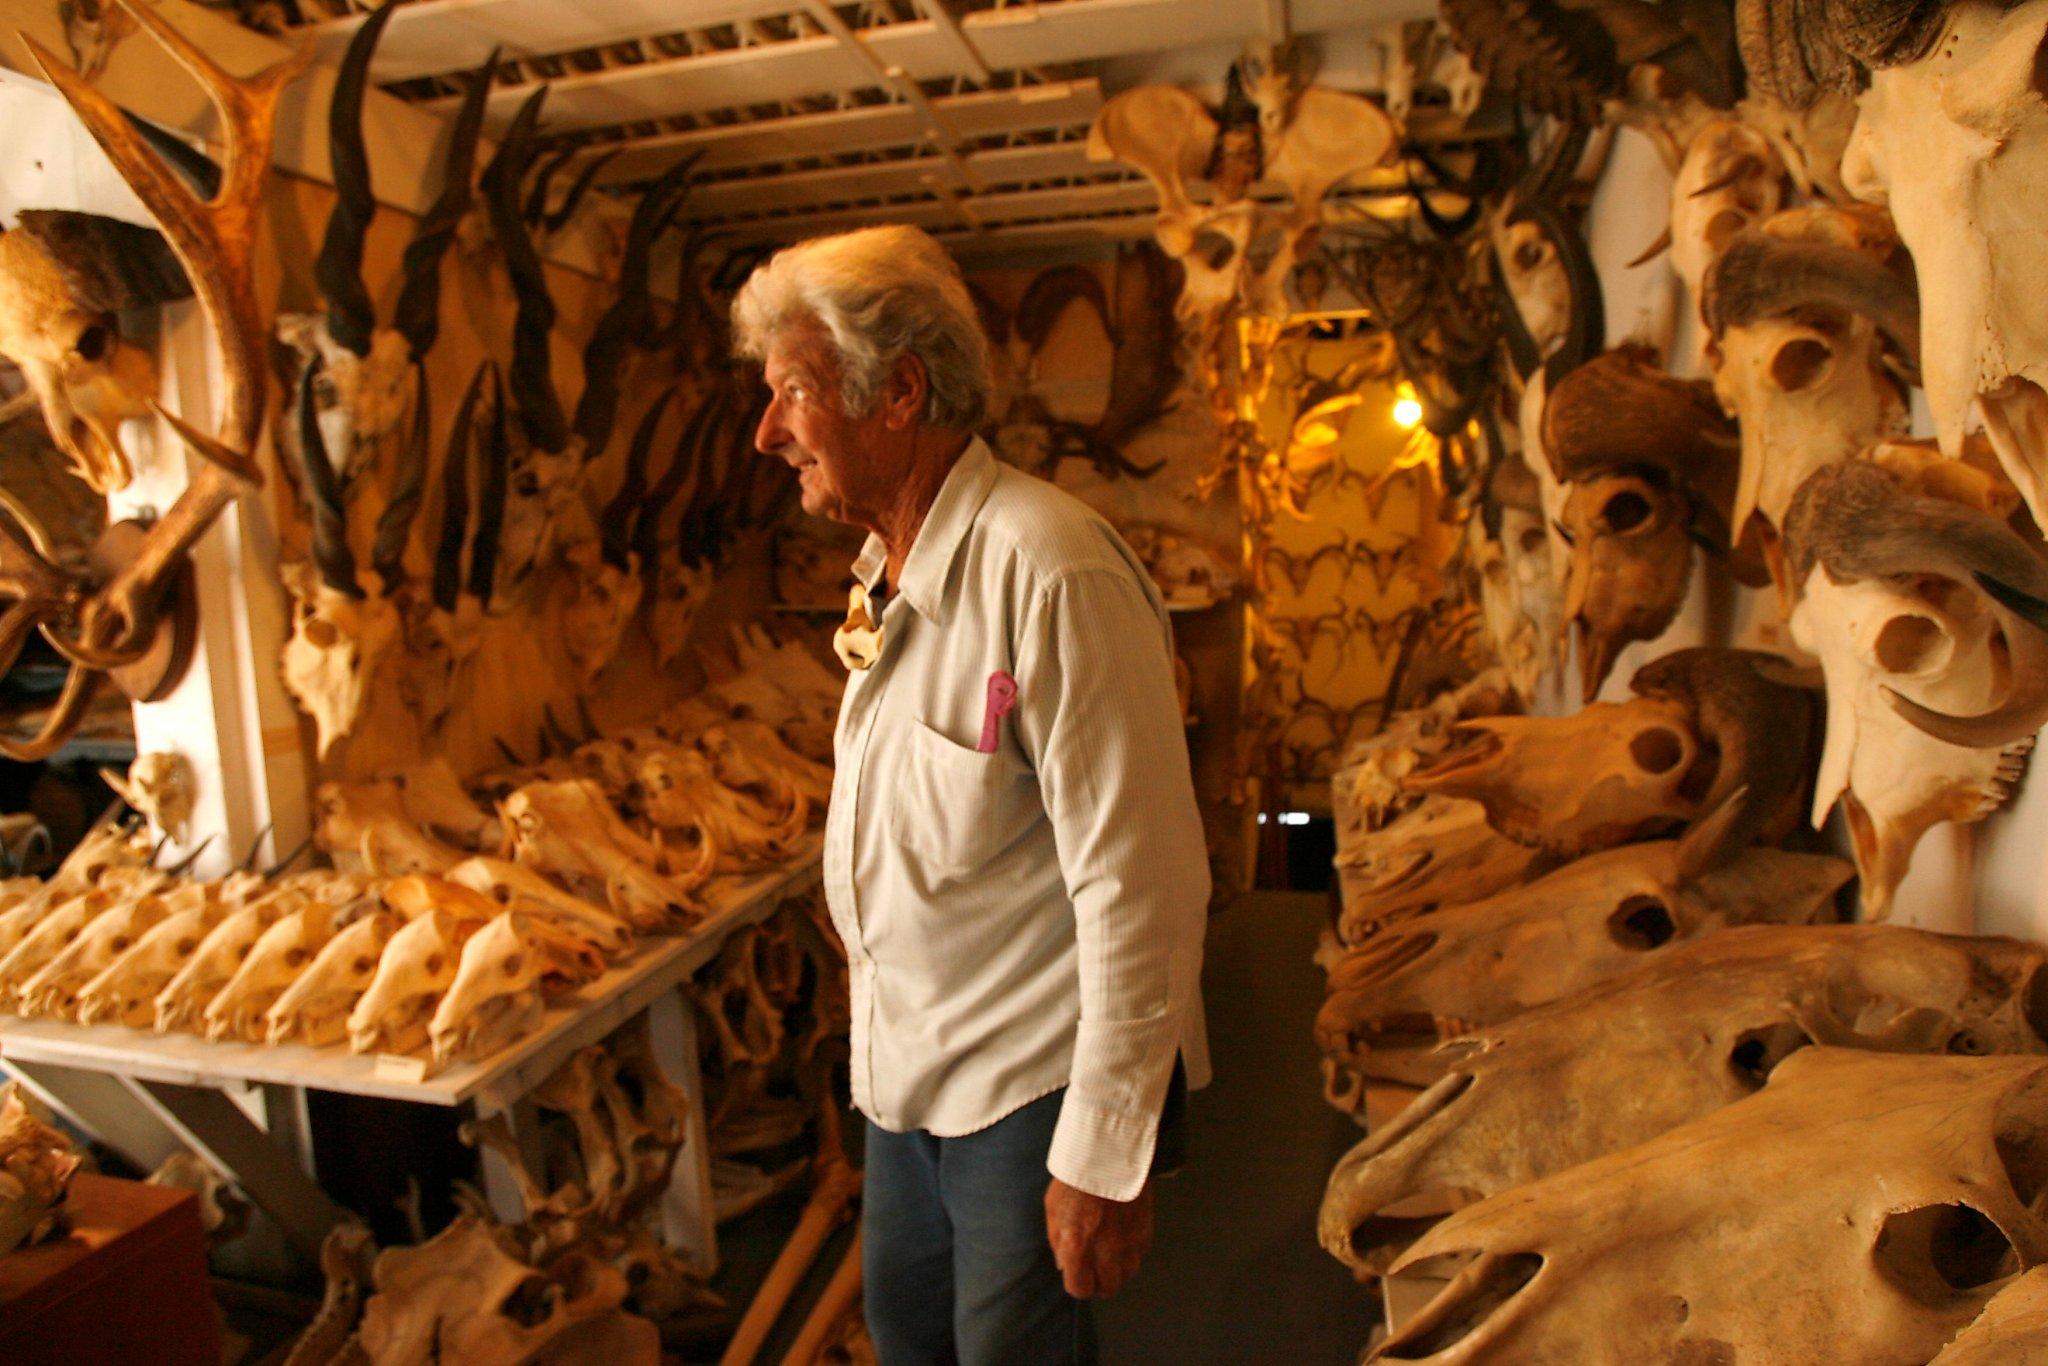 Ray \'Bones\' Bandar, biologist and skull collector, dies at 90 - SFGate